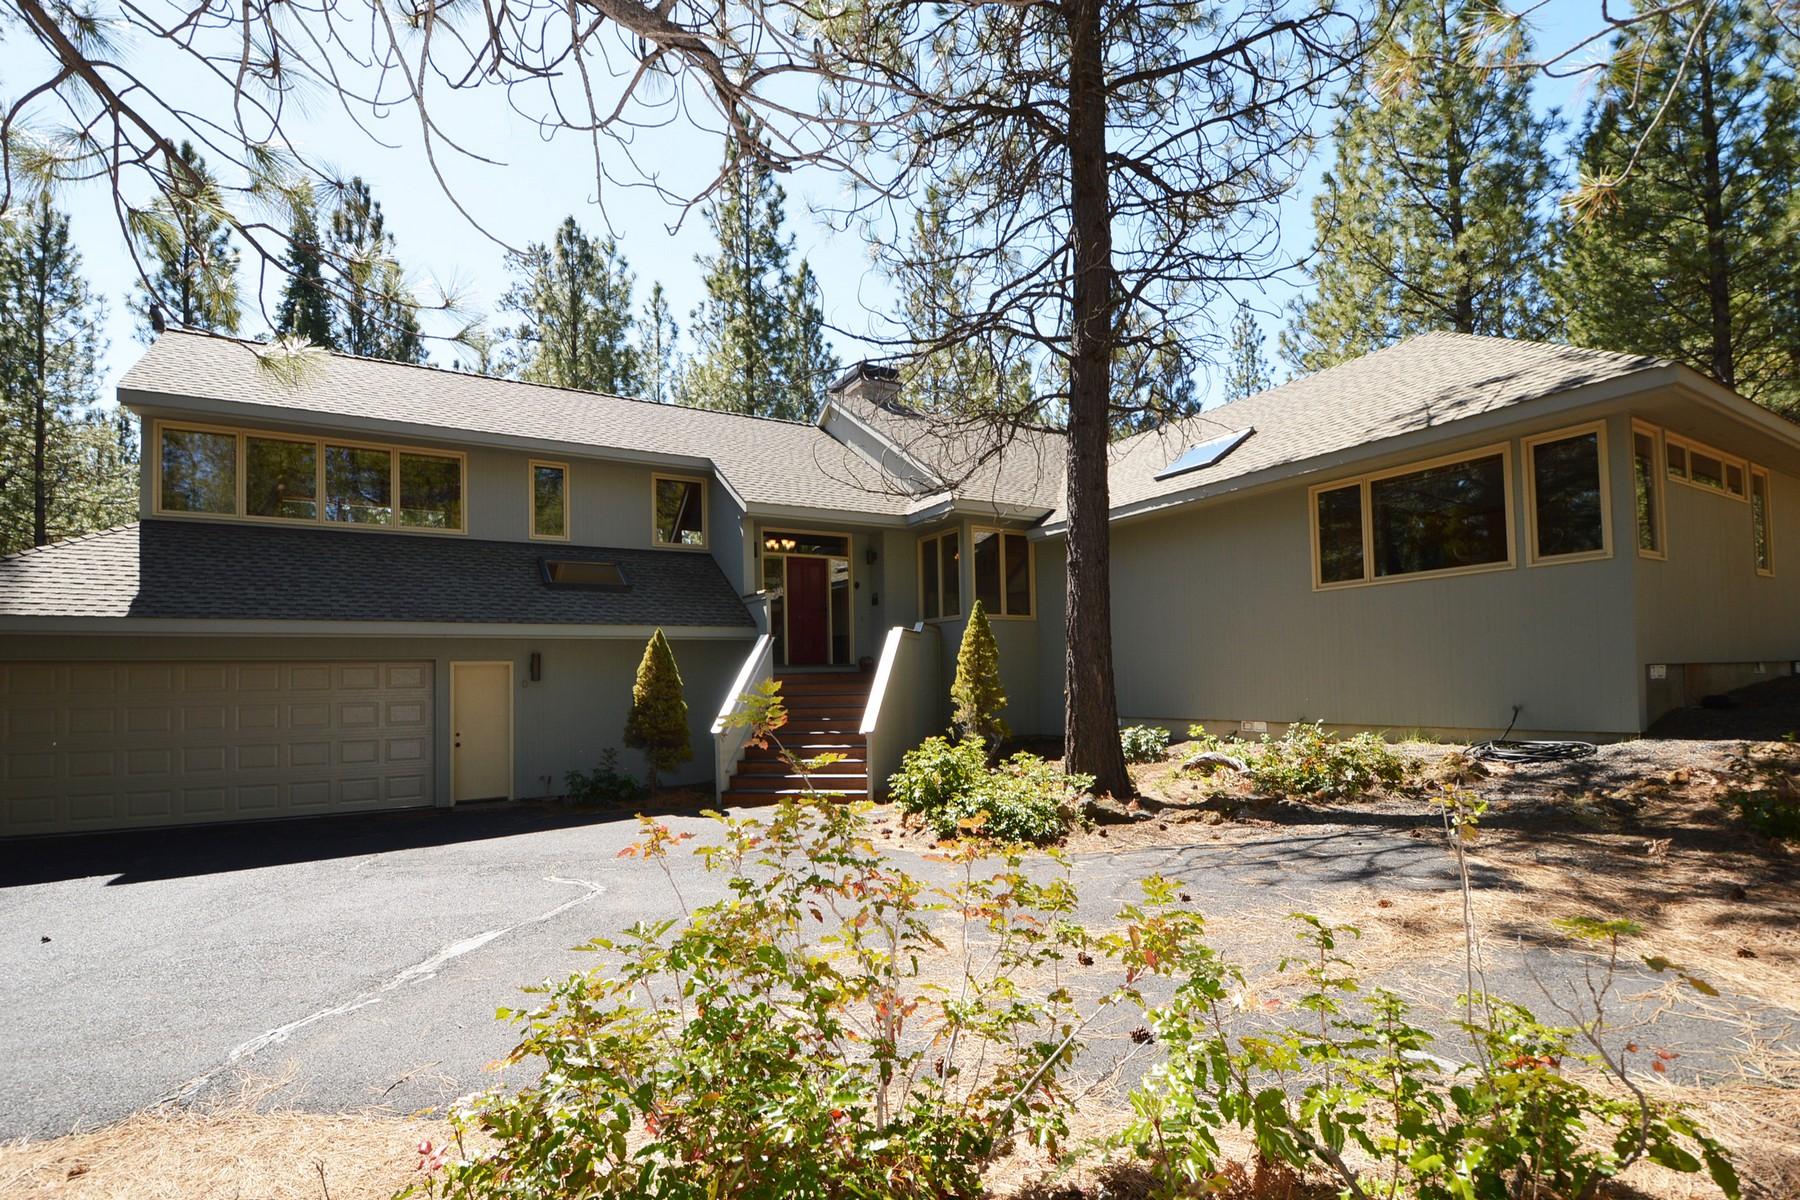 Other Residential Homes για την Πώληση στο 70156 Atherium Black Butte Ranch, OR 97759 Black Butte Ranch, Ορεγκον 97759 Ηνωμένες Πολιτείες